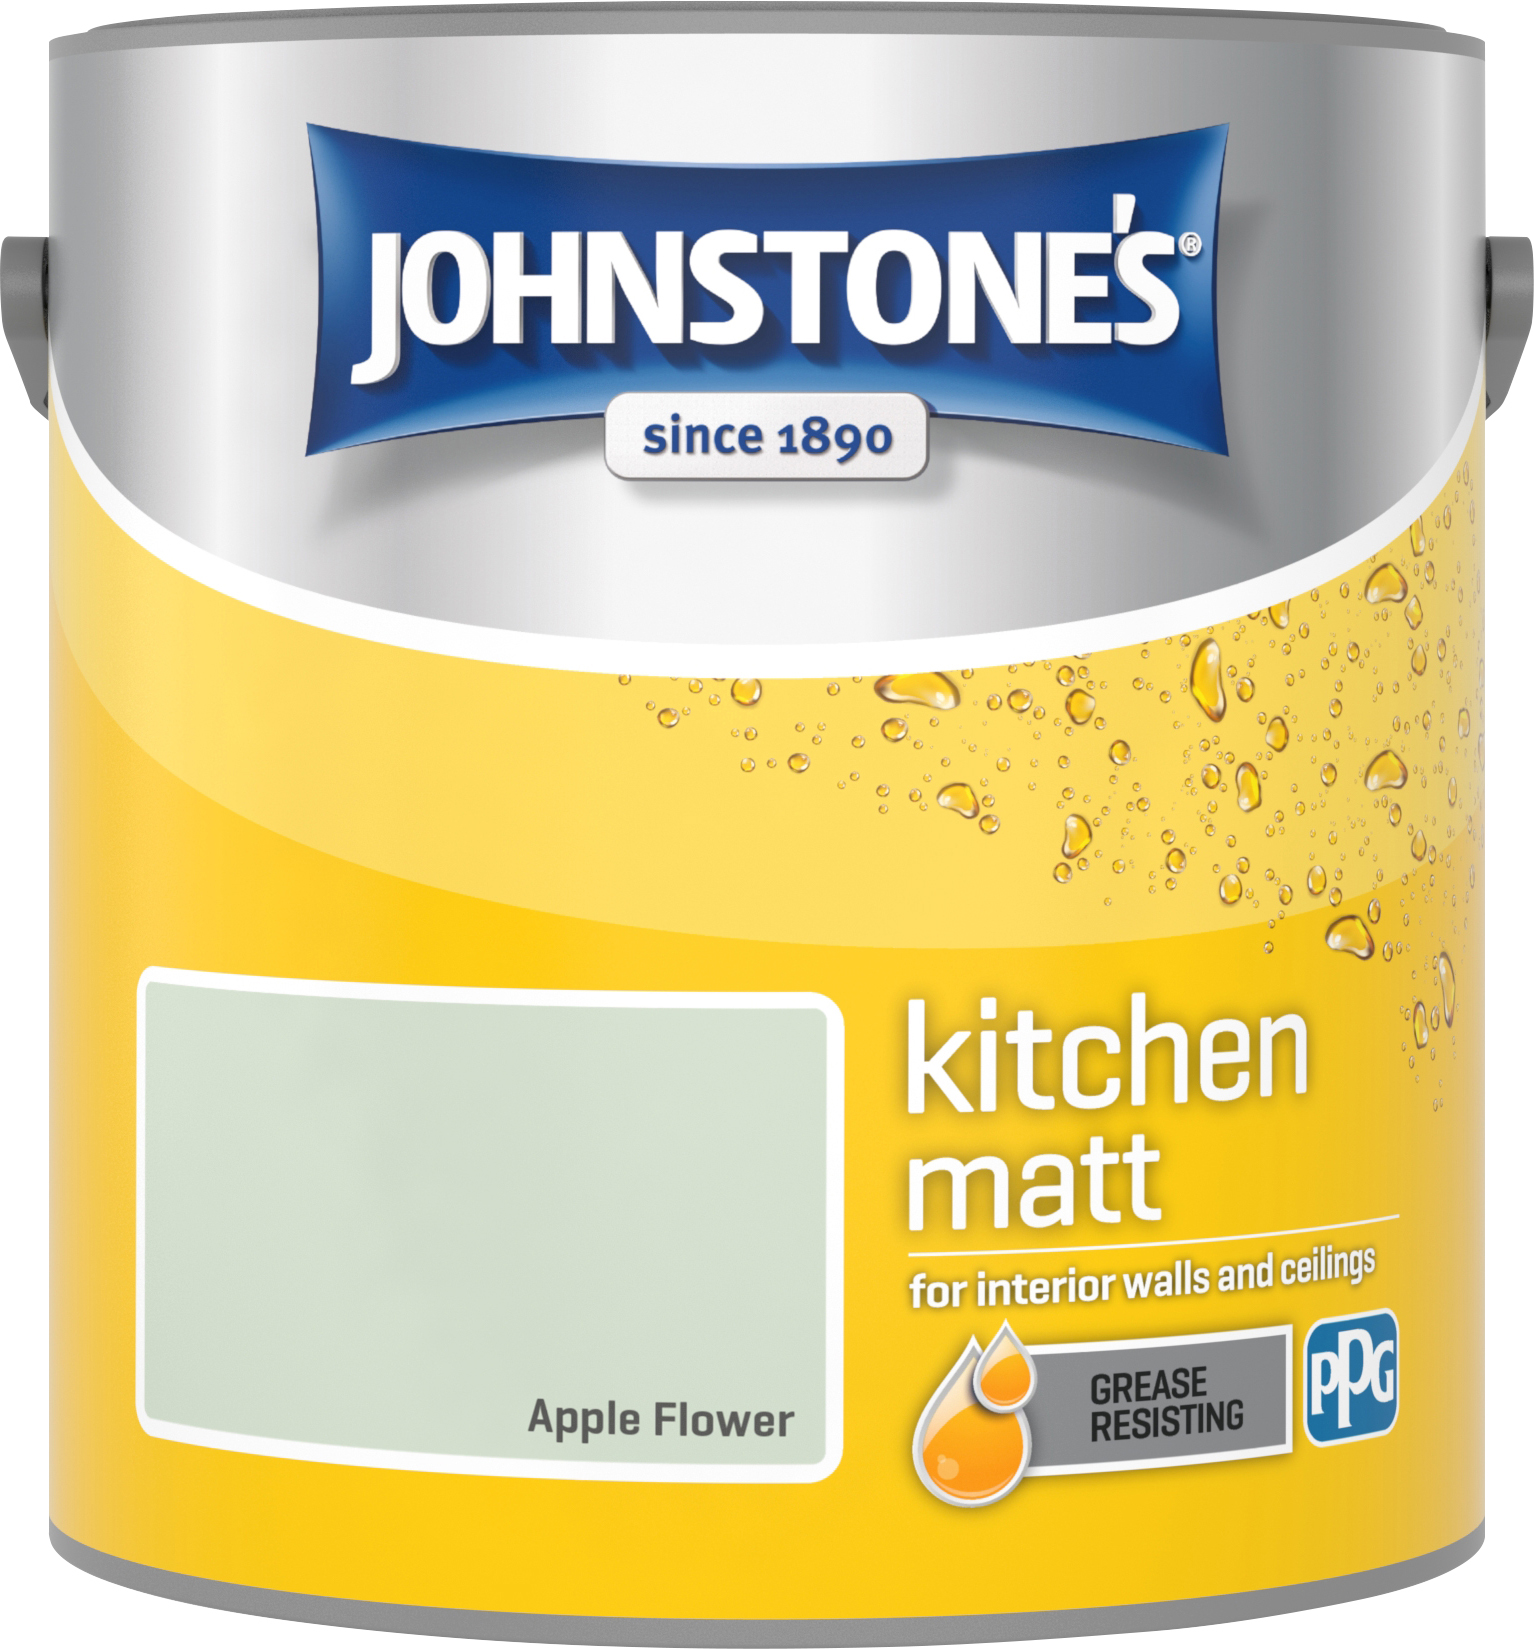 Johnstone's 2.5 Litre Kitchen Paint - Apple Flower